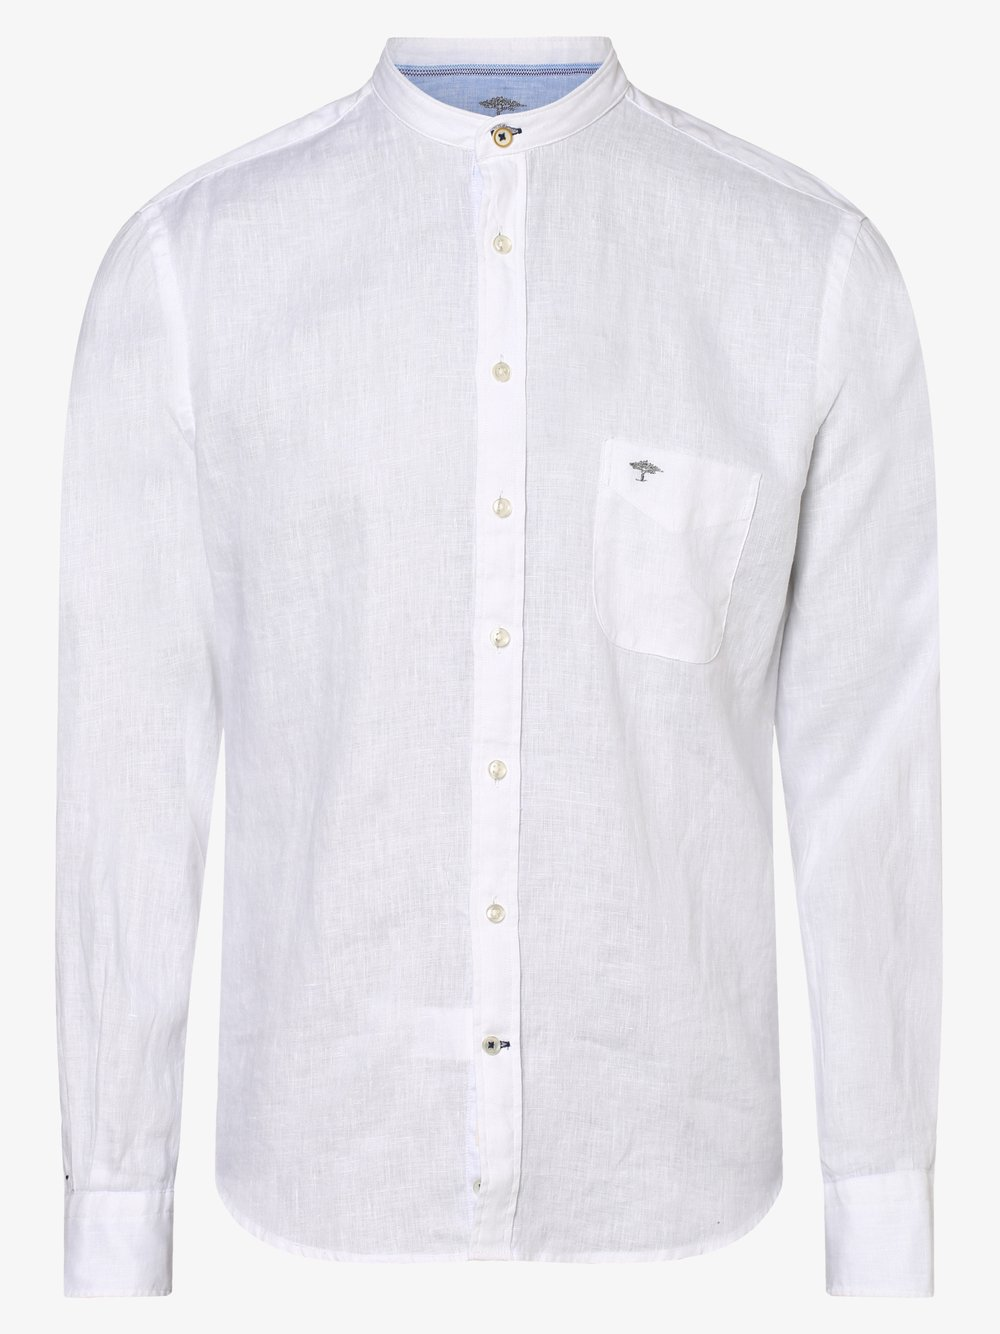 Fynch-Hatton – Męska koszula lniana, biały Van Graaf 464089-0001-09970